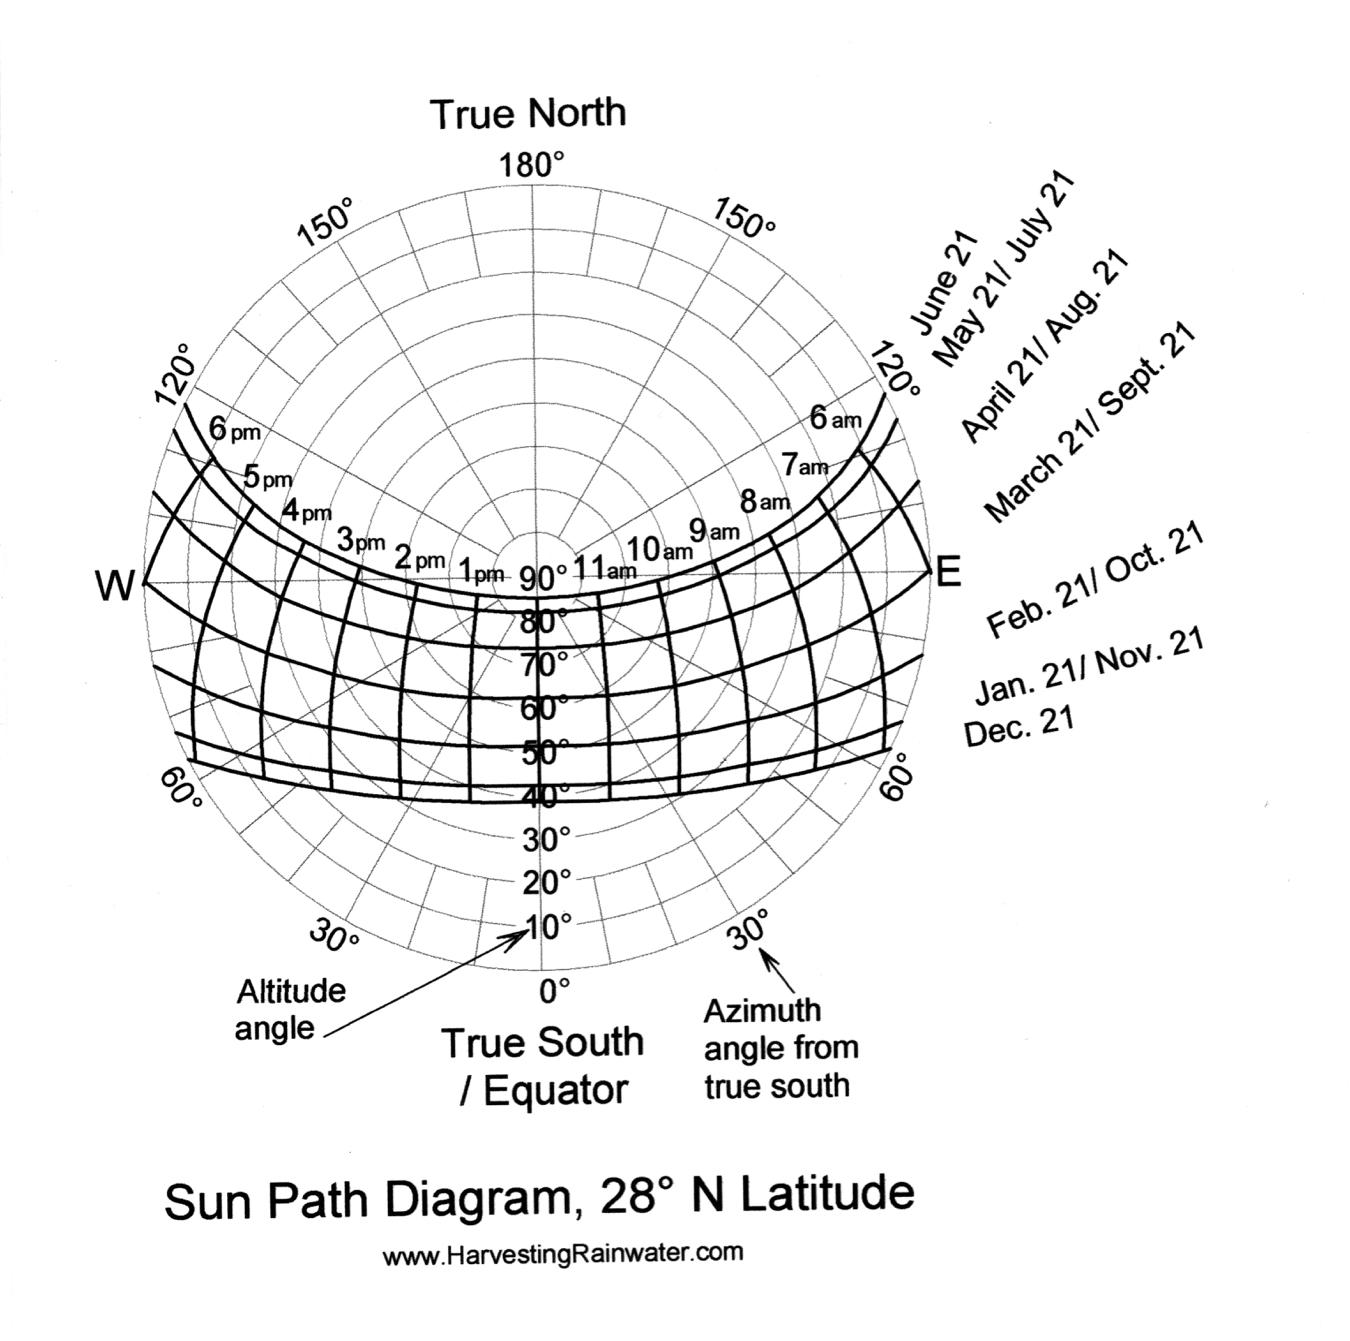 hight resolution of sun path diagram 28 n latitude